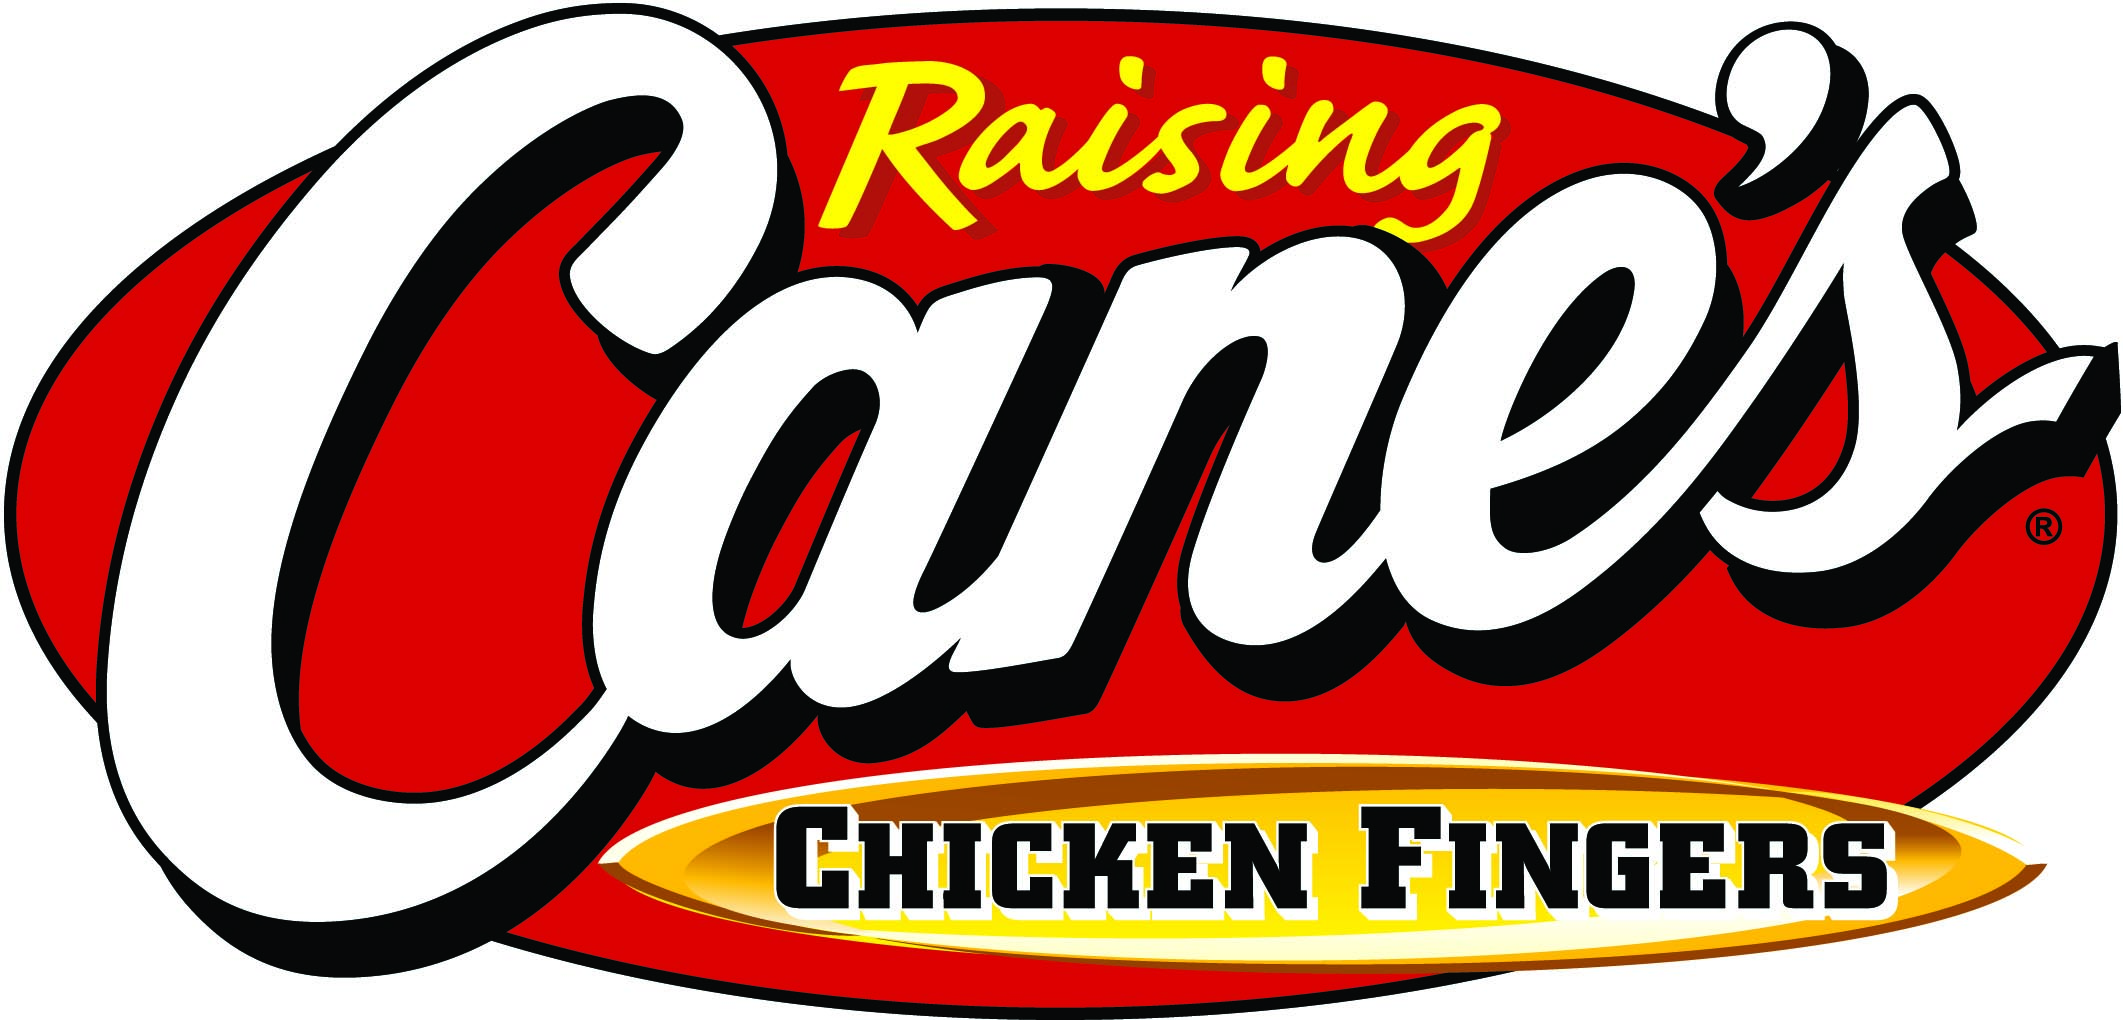 Raising Canes's Chicken Fingers